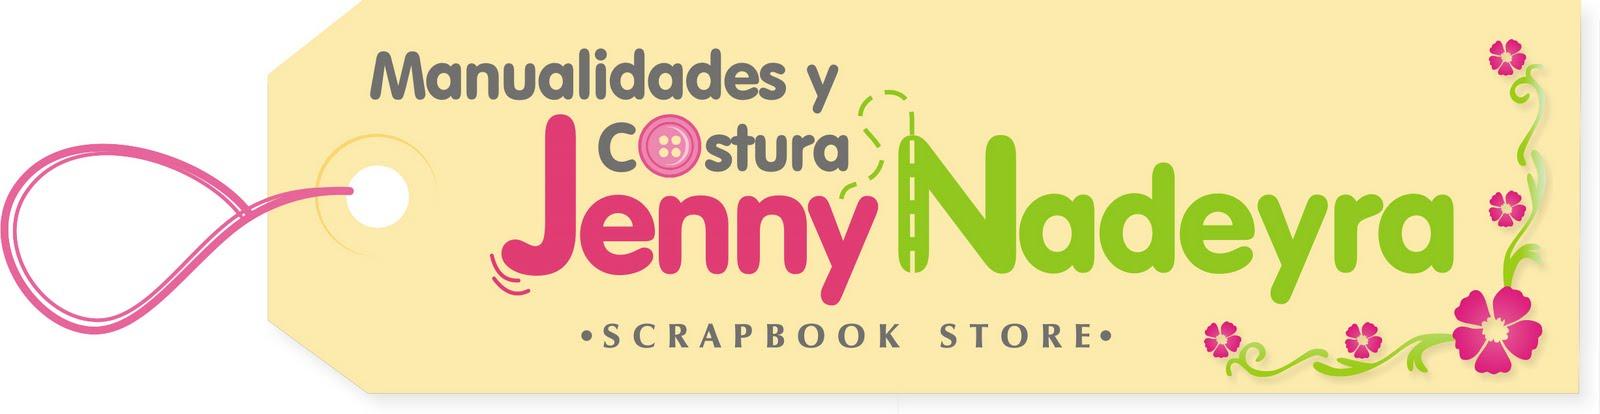 SCRAPBOOK JENNY NADEYRA